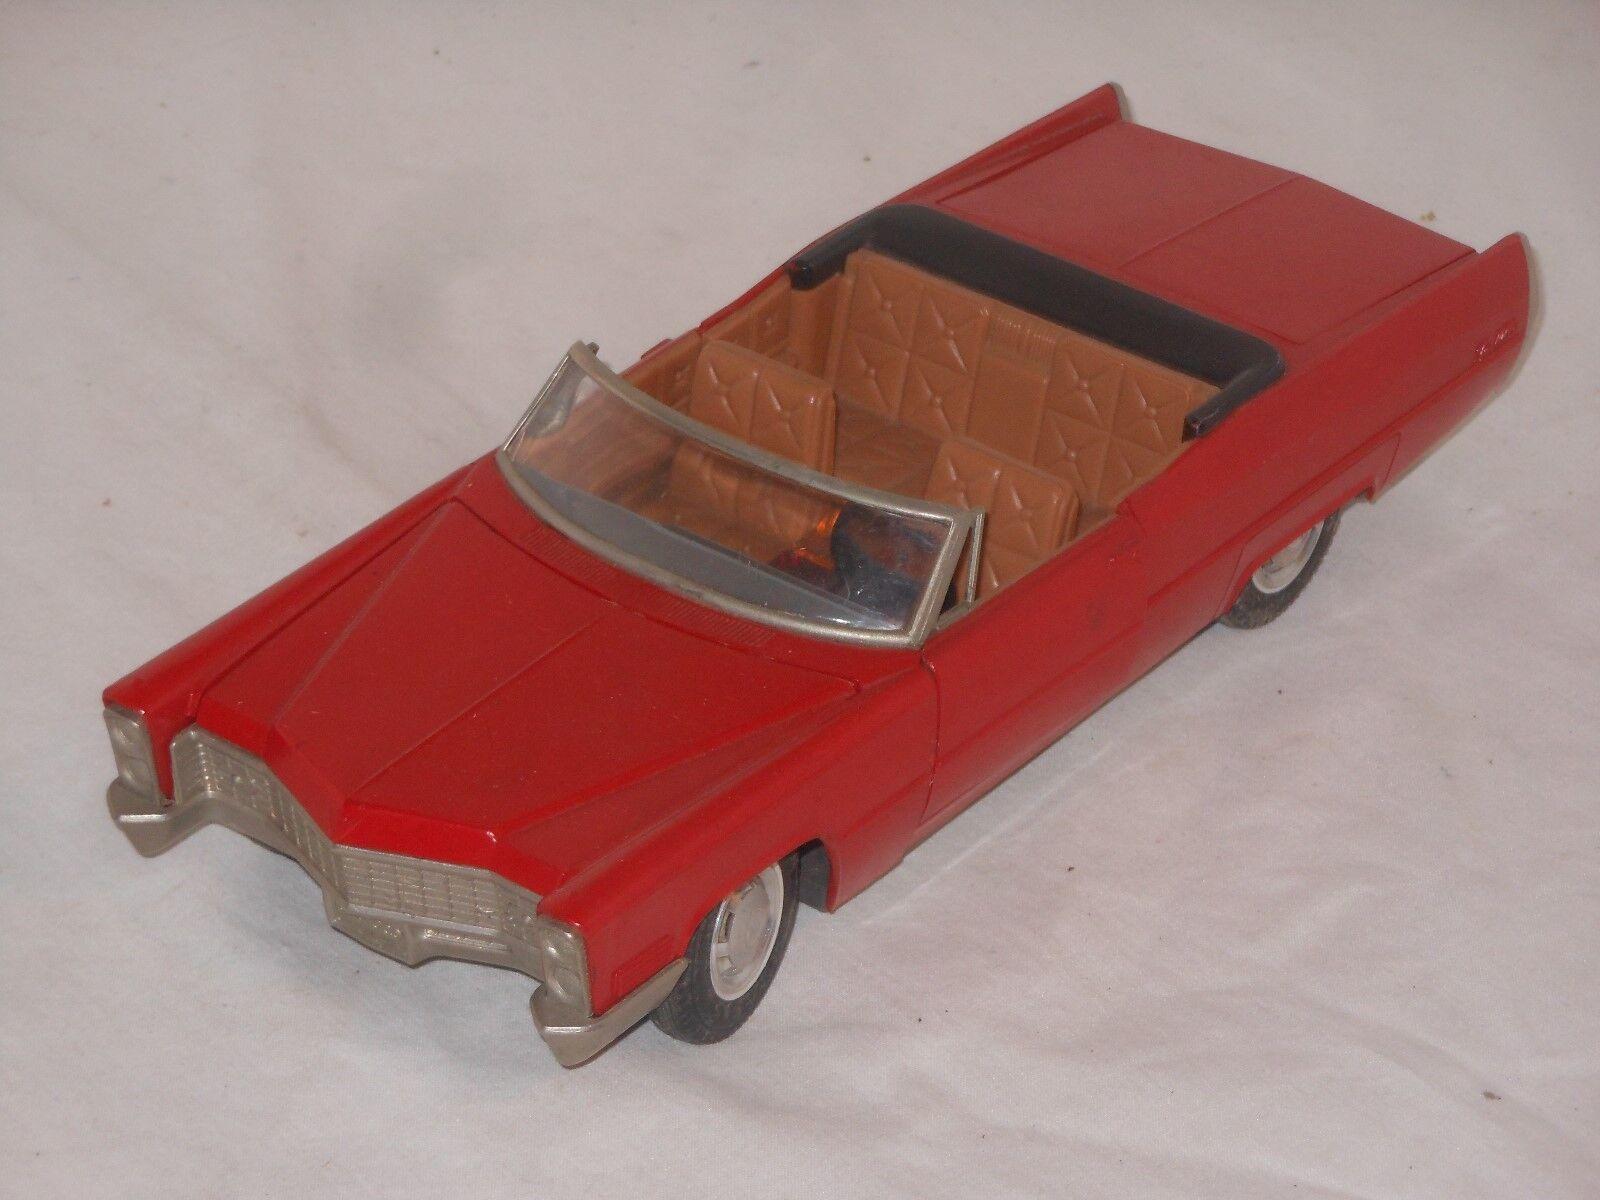 SCHUCO - VINTAGE TOY CAR - CADILLAC DE - VILLE - 5505 - DE 1968 - 20/3 d10e69